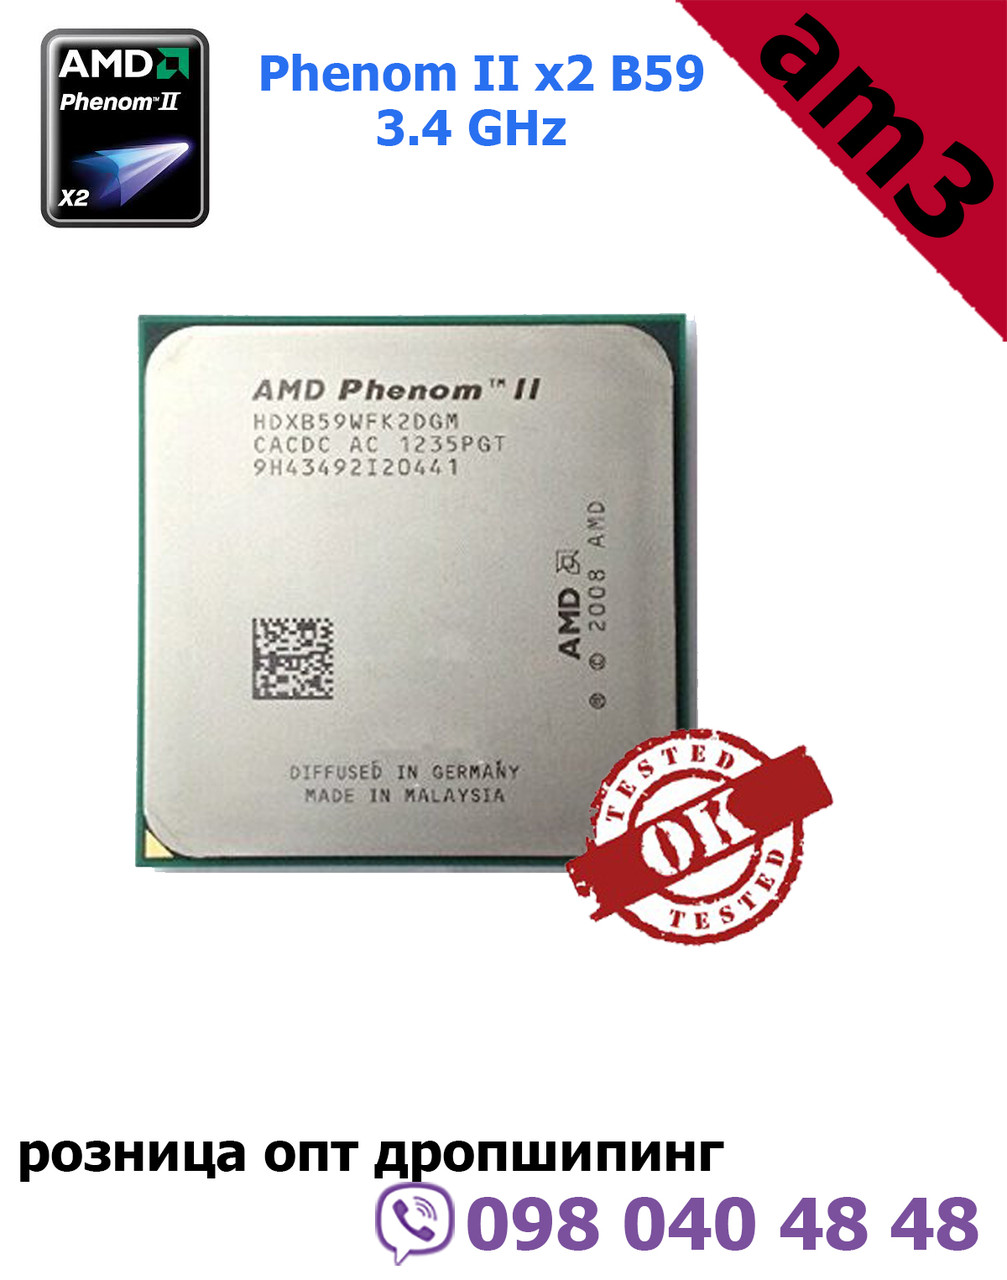 Процессор AMD Phenom II X2 b59, 2 ядра, 3.4 ГГц, AM3